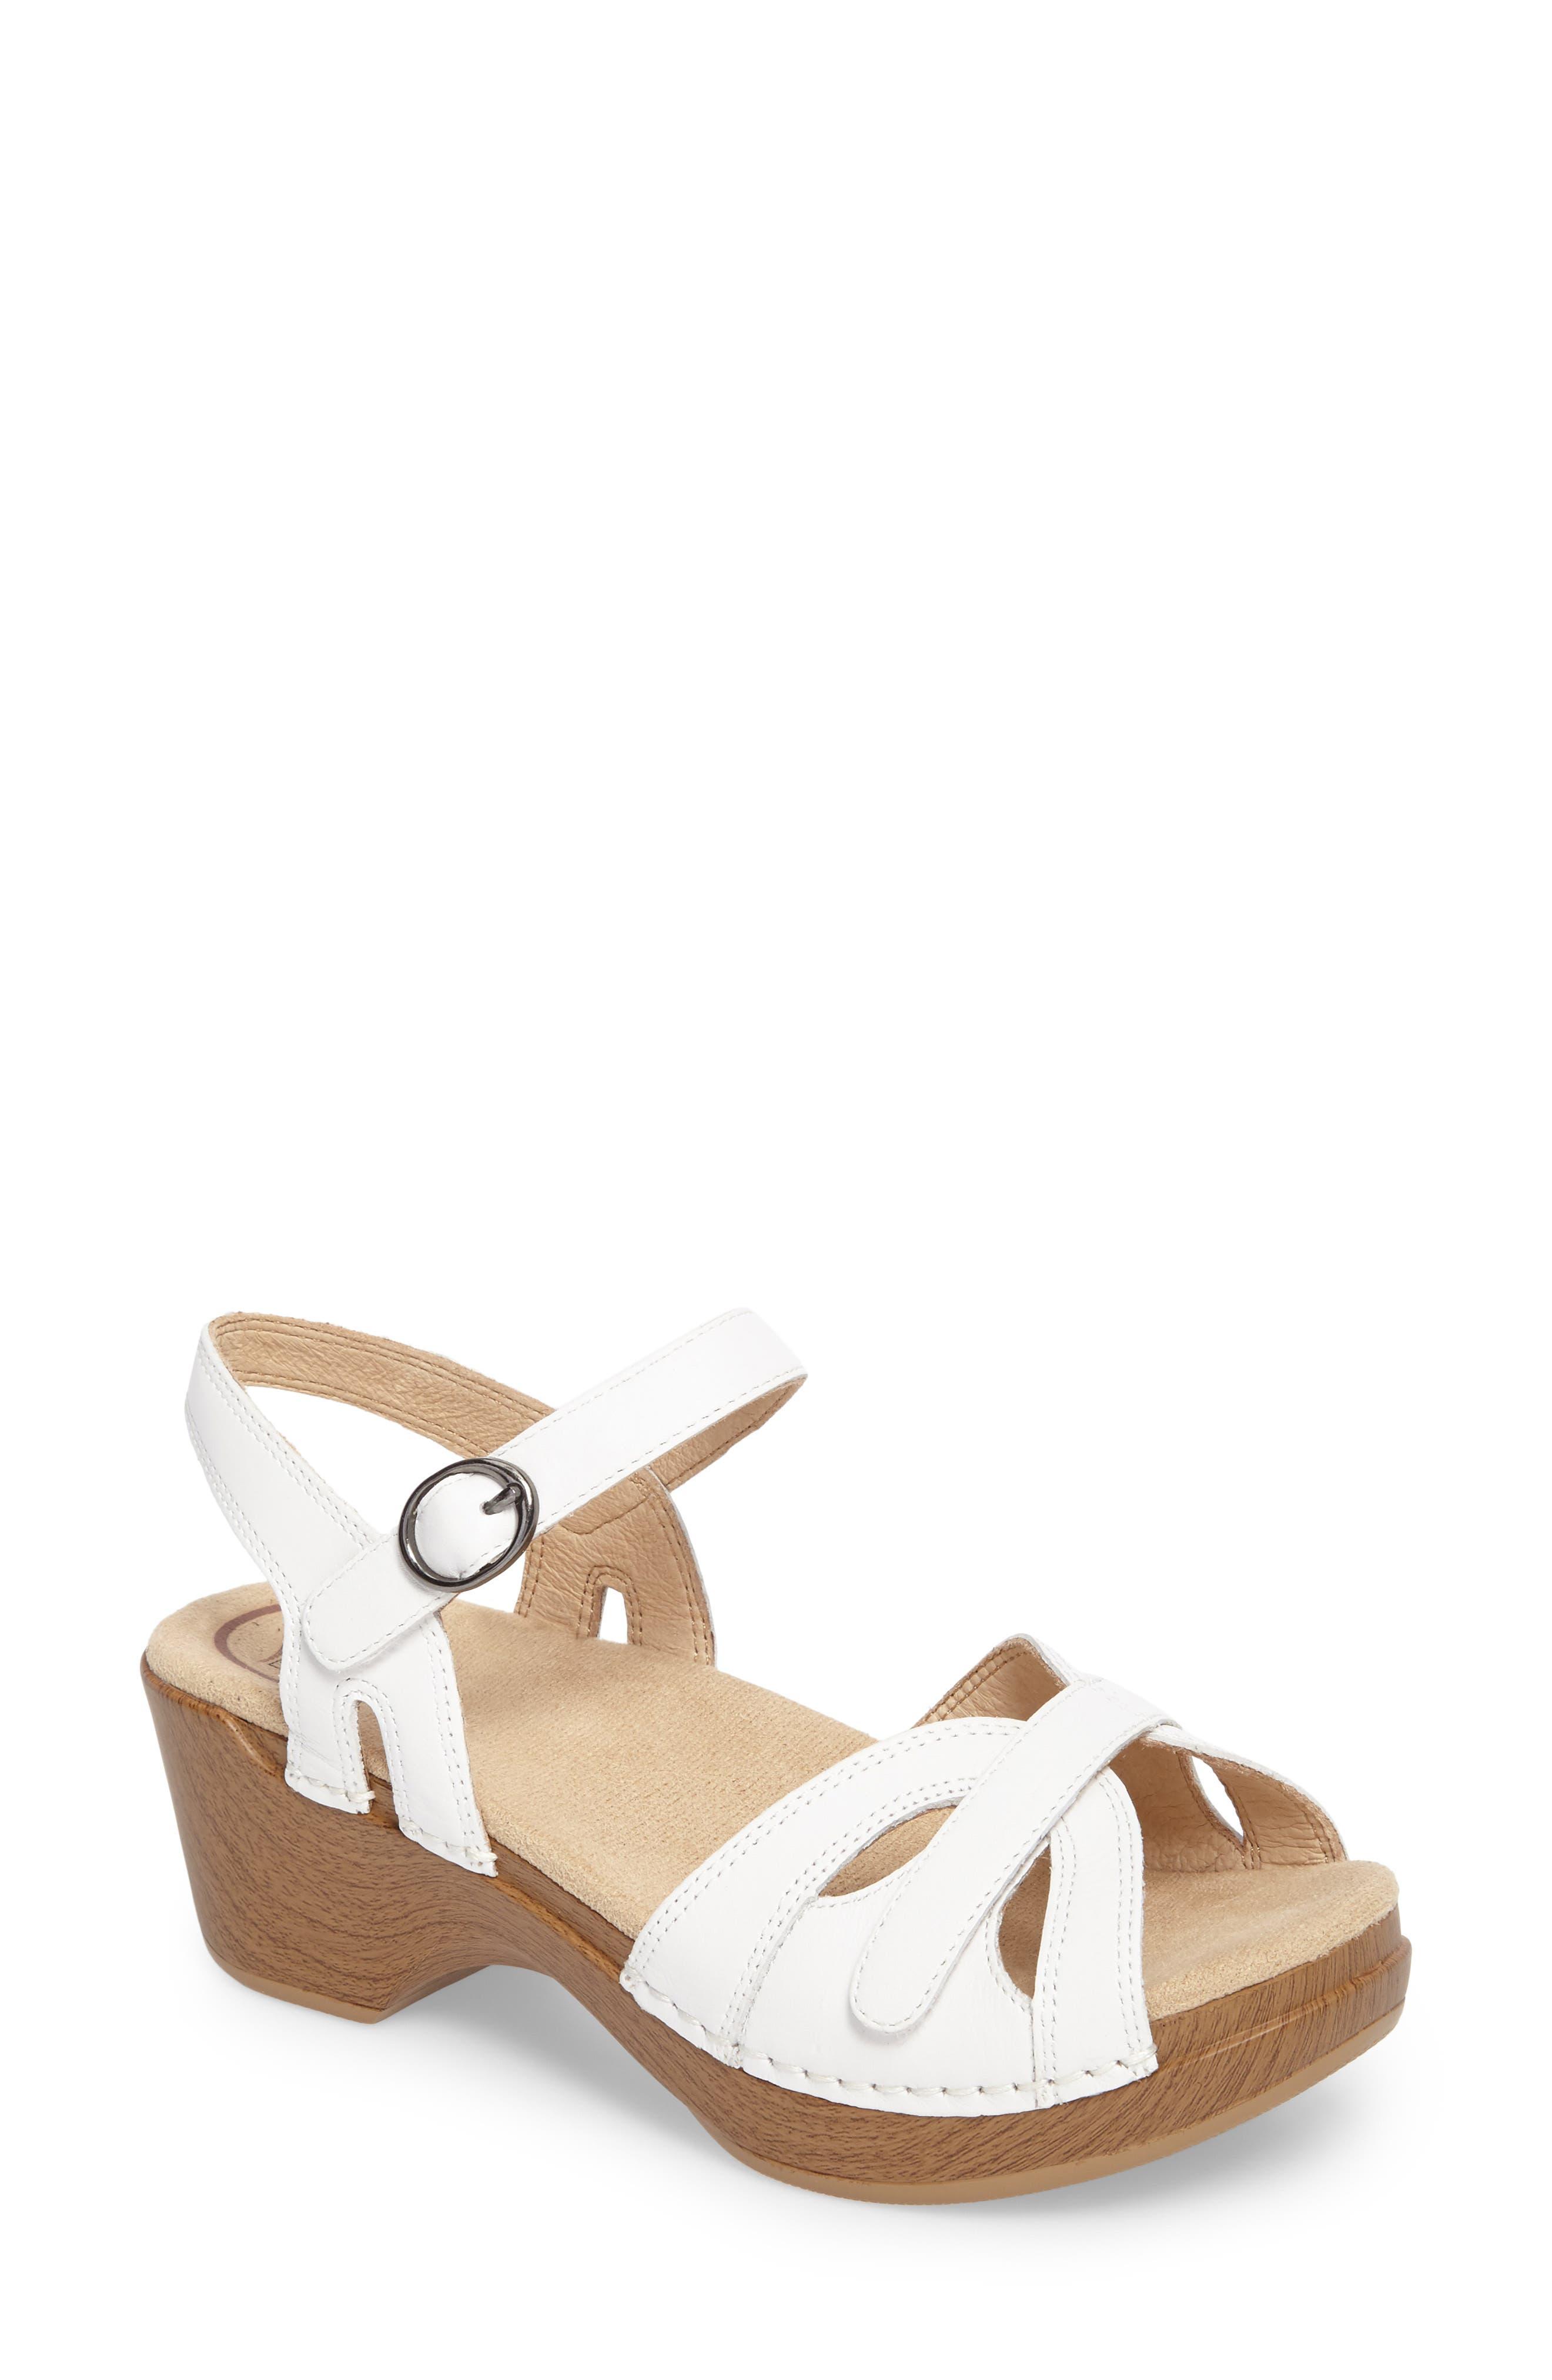 Season Sandal,                         Main,                         color, WHITE LEATHER